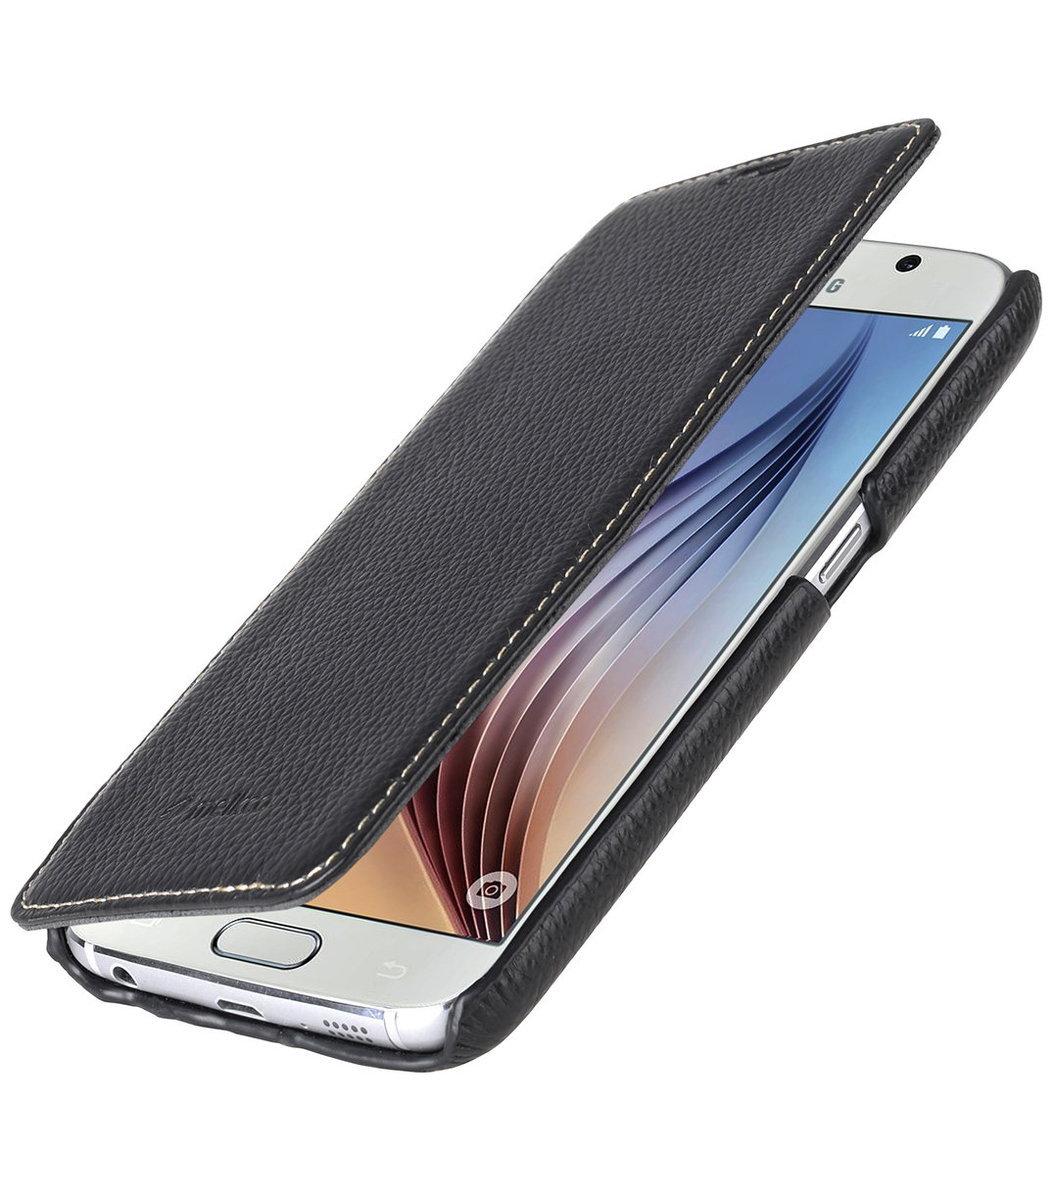 Samsung Galaxy S6  Face cover book Type高級真皮革手機套(黑色荔枝條紋)